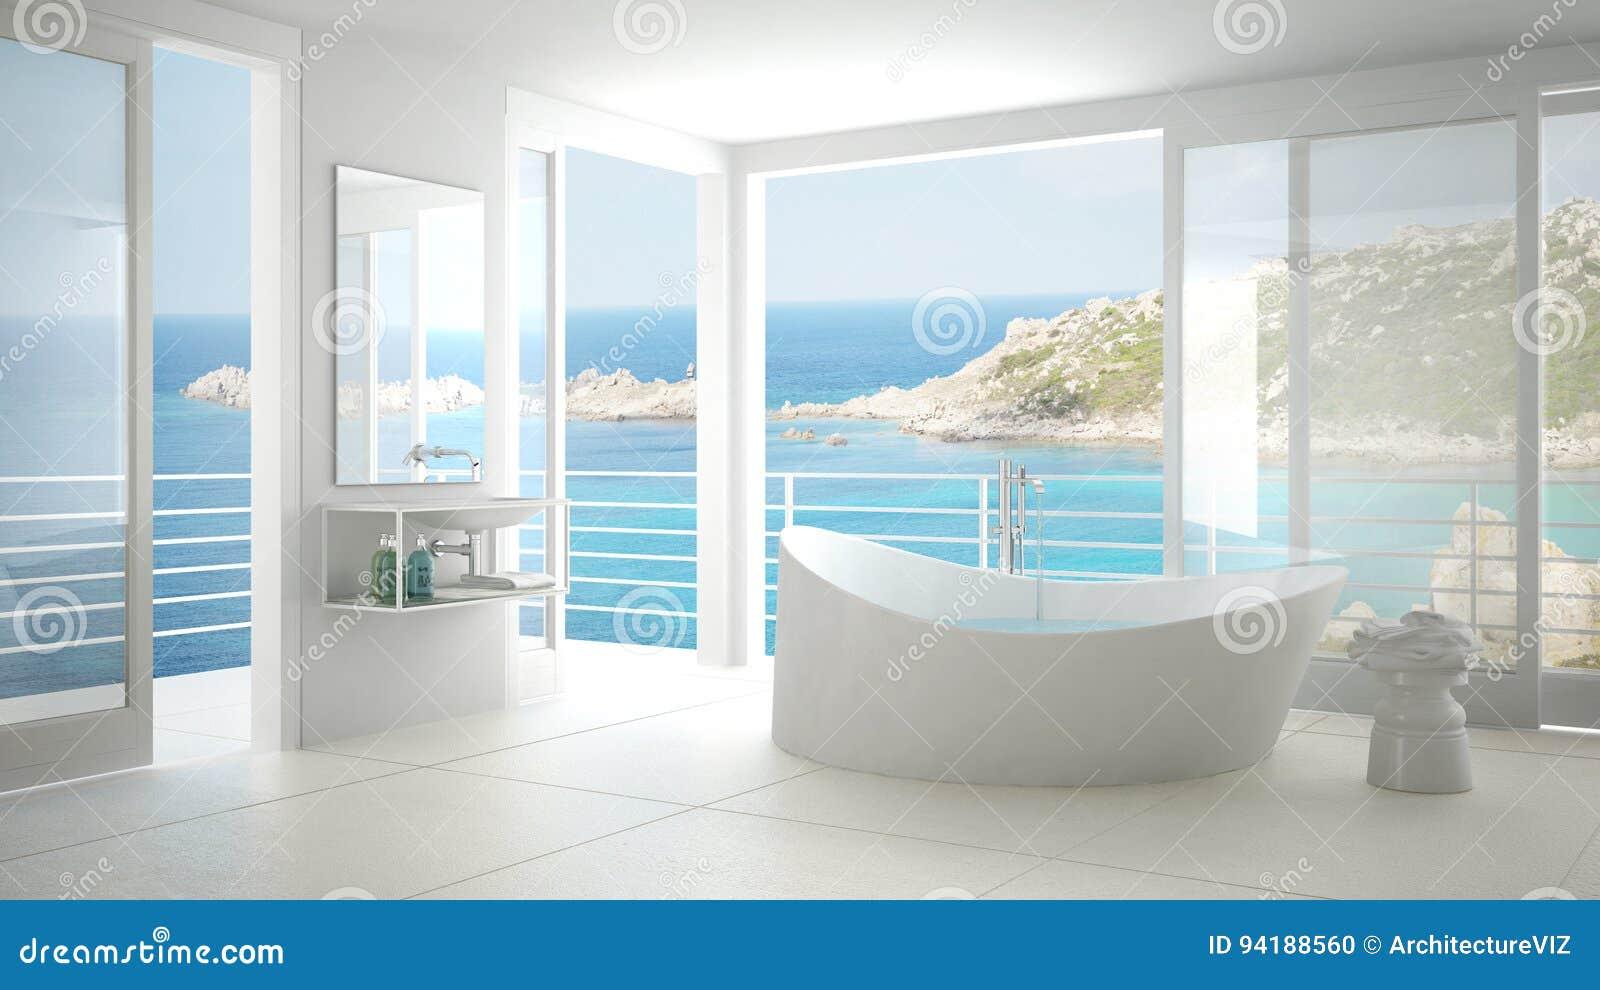 Minimalist Bathroom With Big Bath Tub And Panoramic Window Stock ...